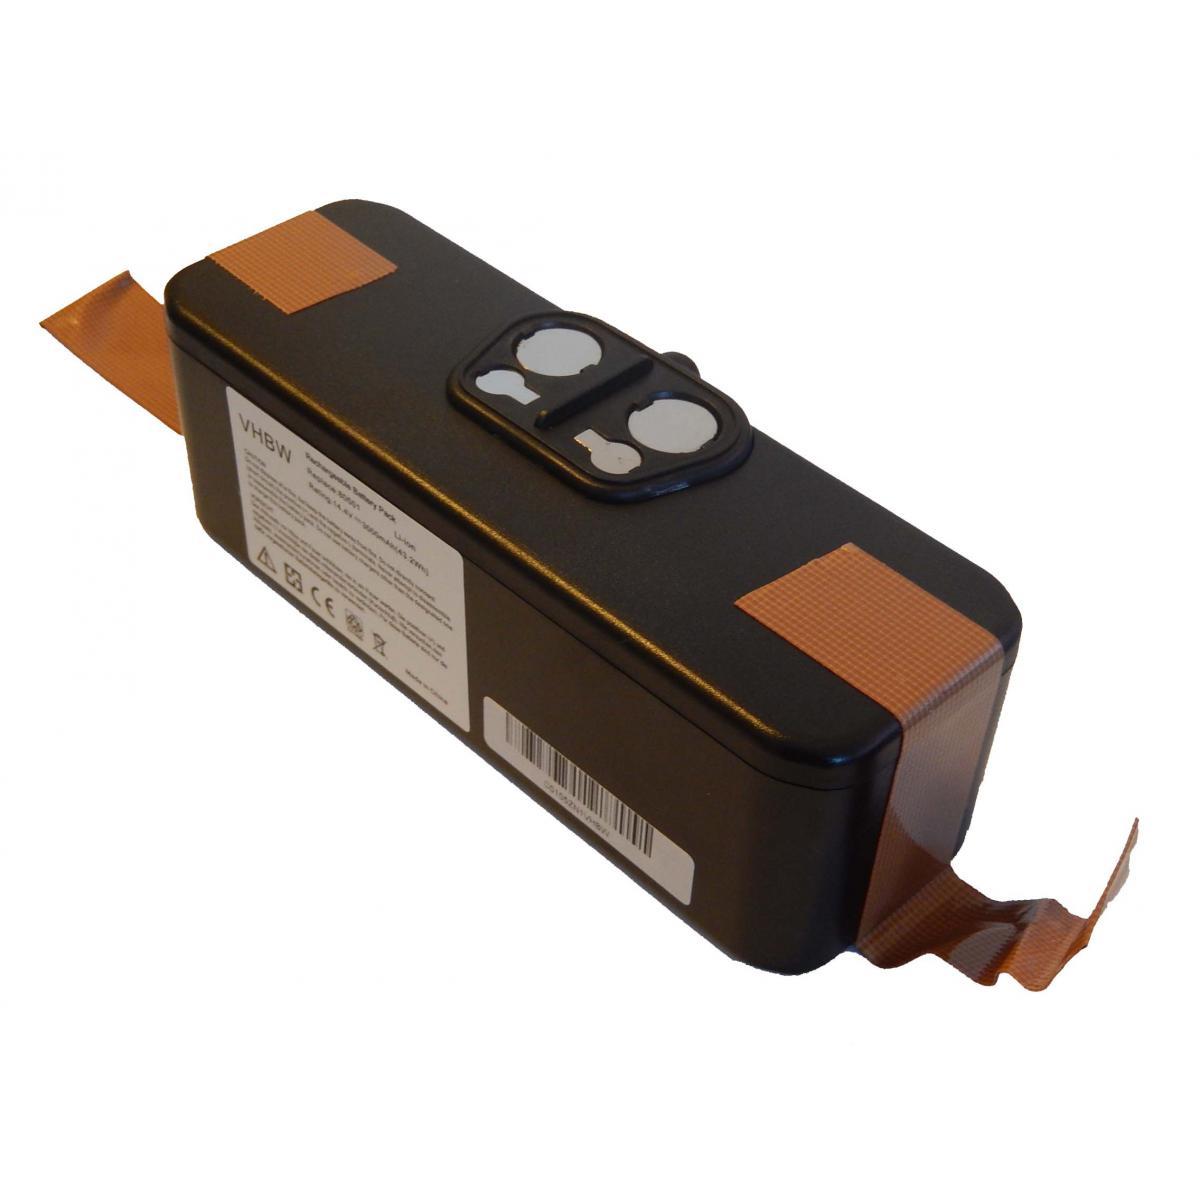 Vhbw vhbw Batterie Li-Ion 3000mAh (14.4V) compatible avec iRobot Roomba 620, 625, 630, 650 aspirateur remplace 11702, GD-Room